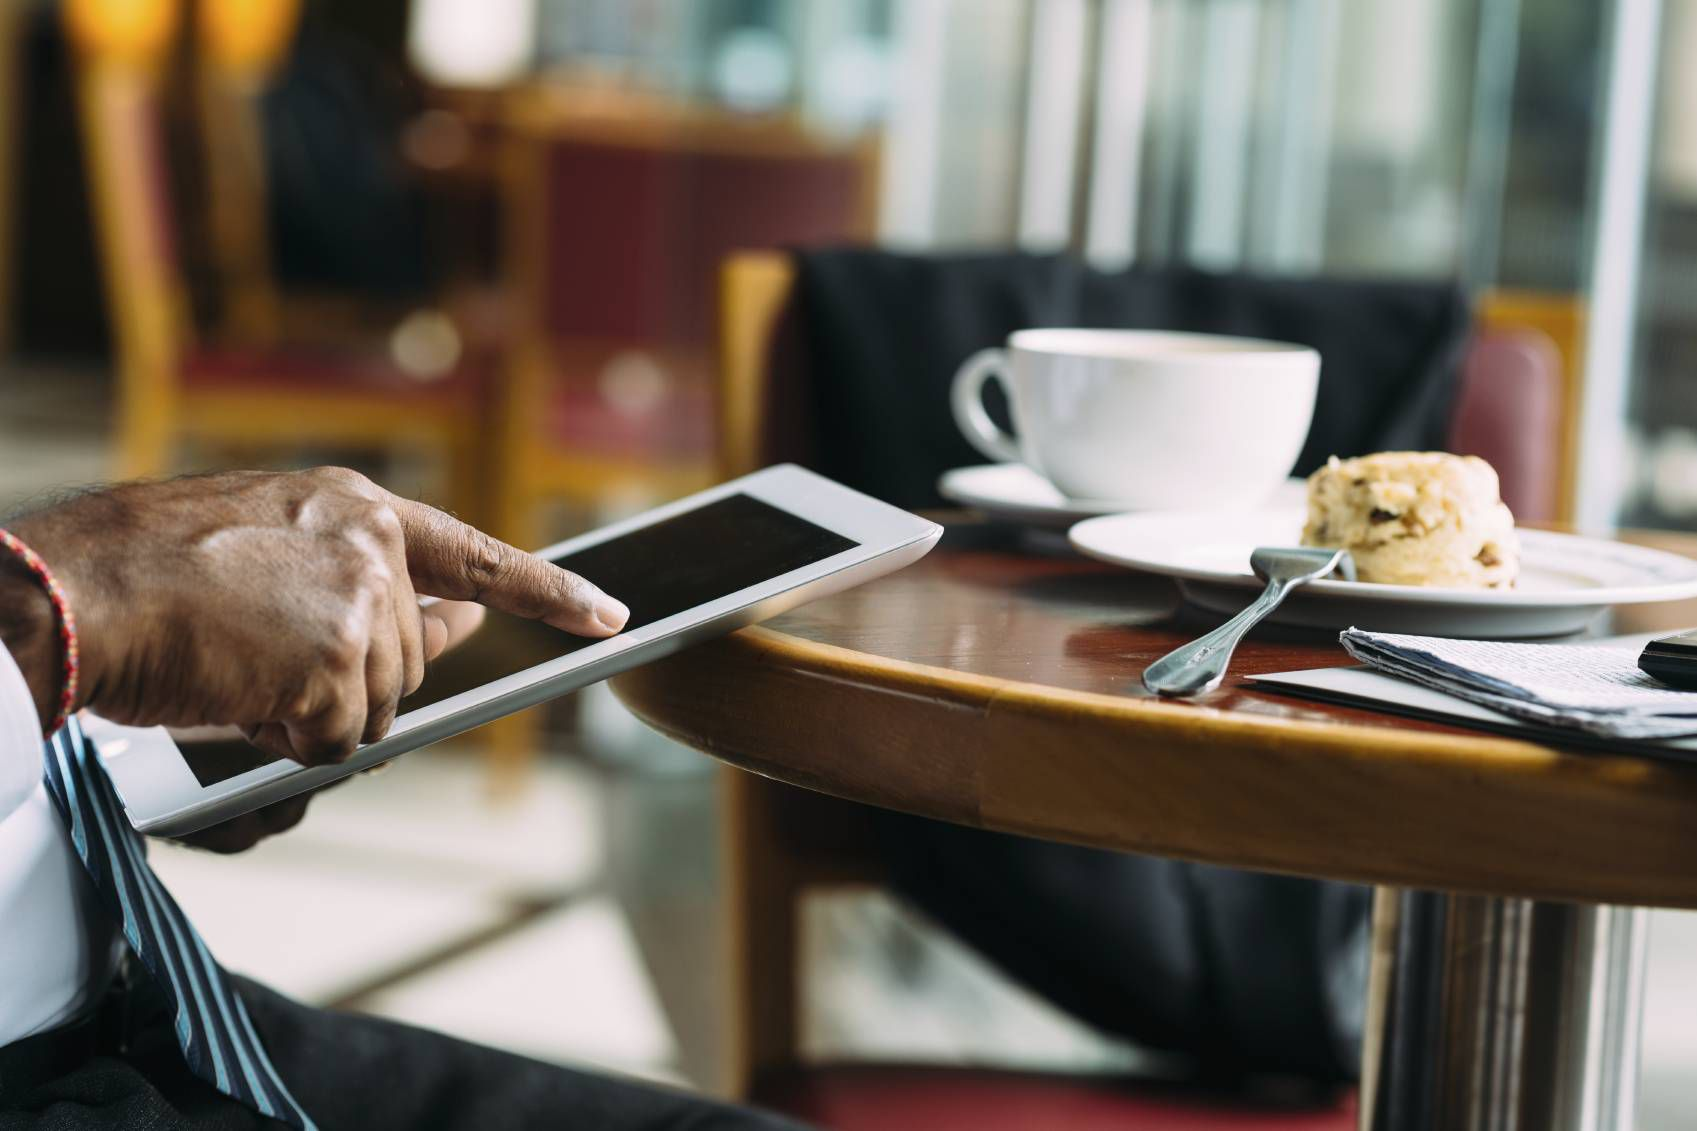 Stanford researchers using Toronto-based Wattpad's stories